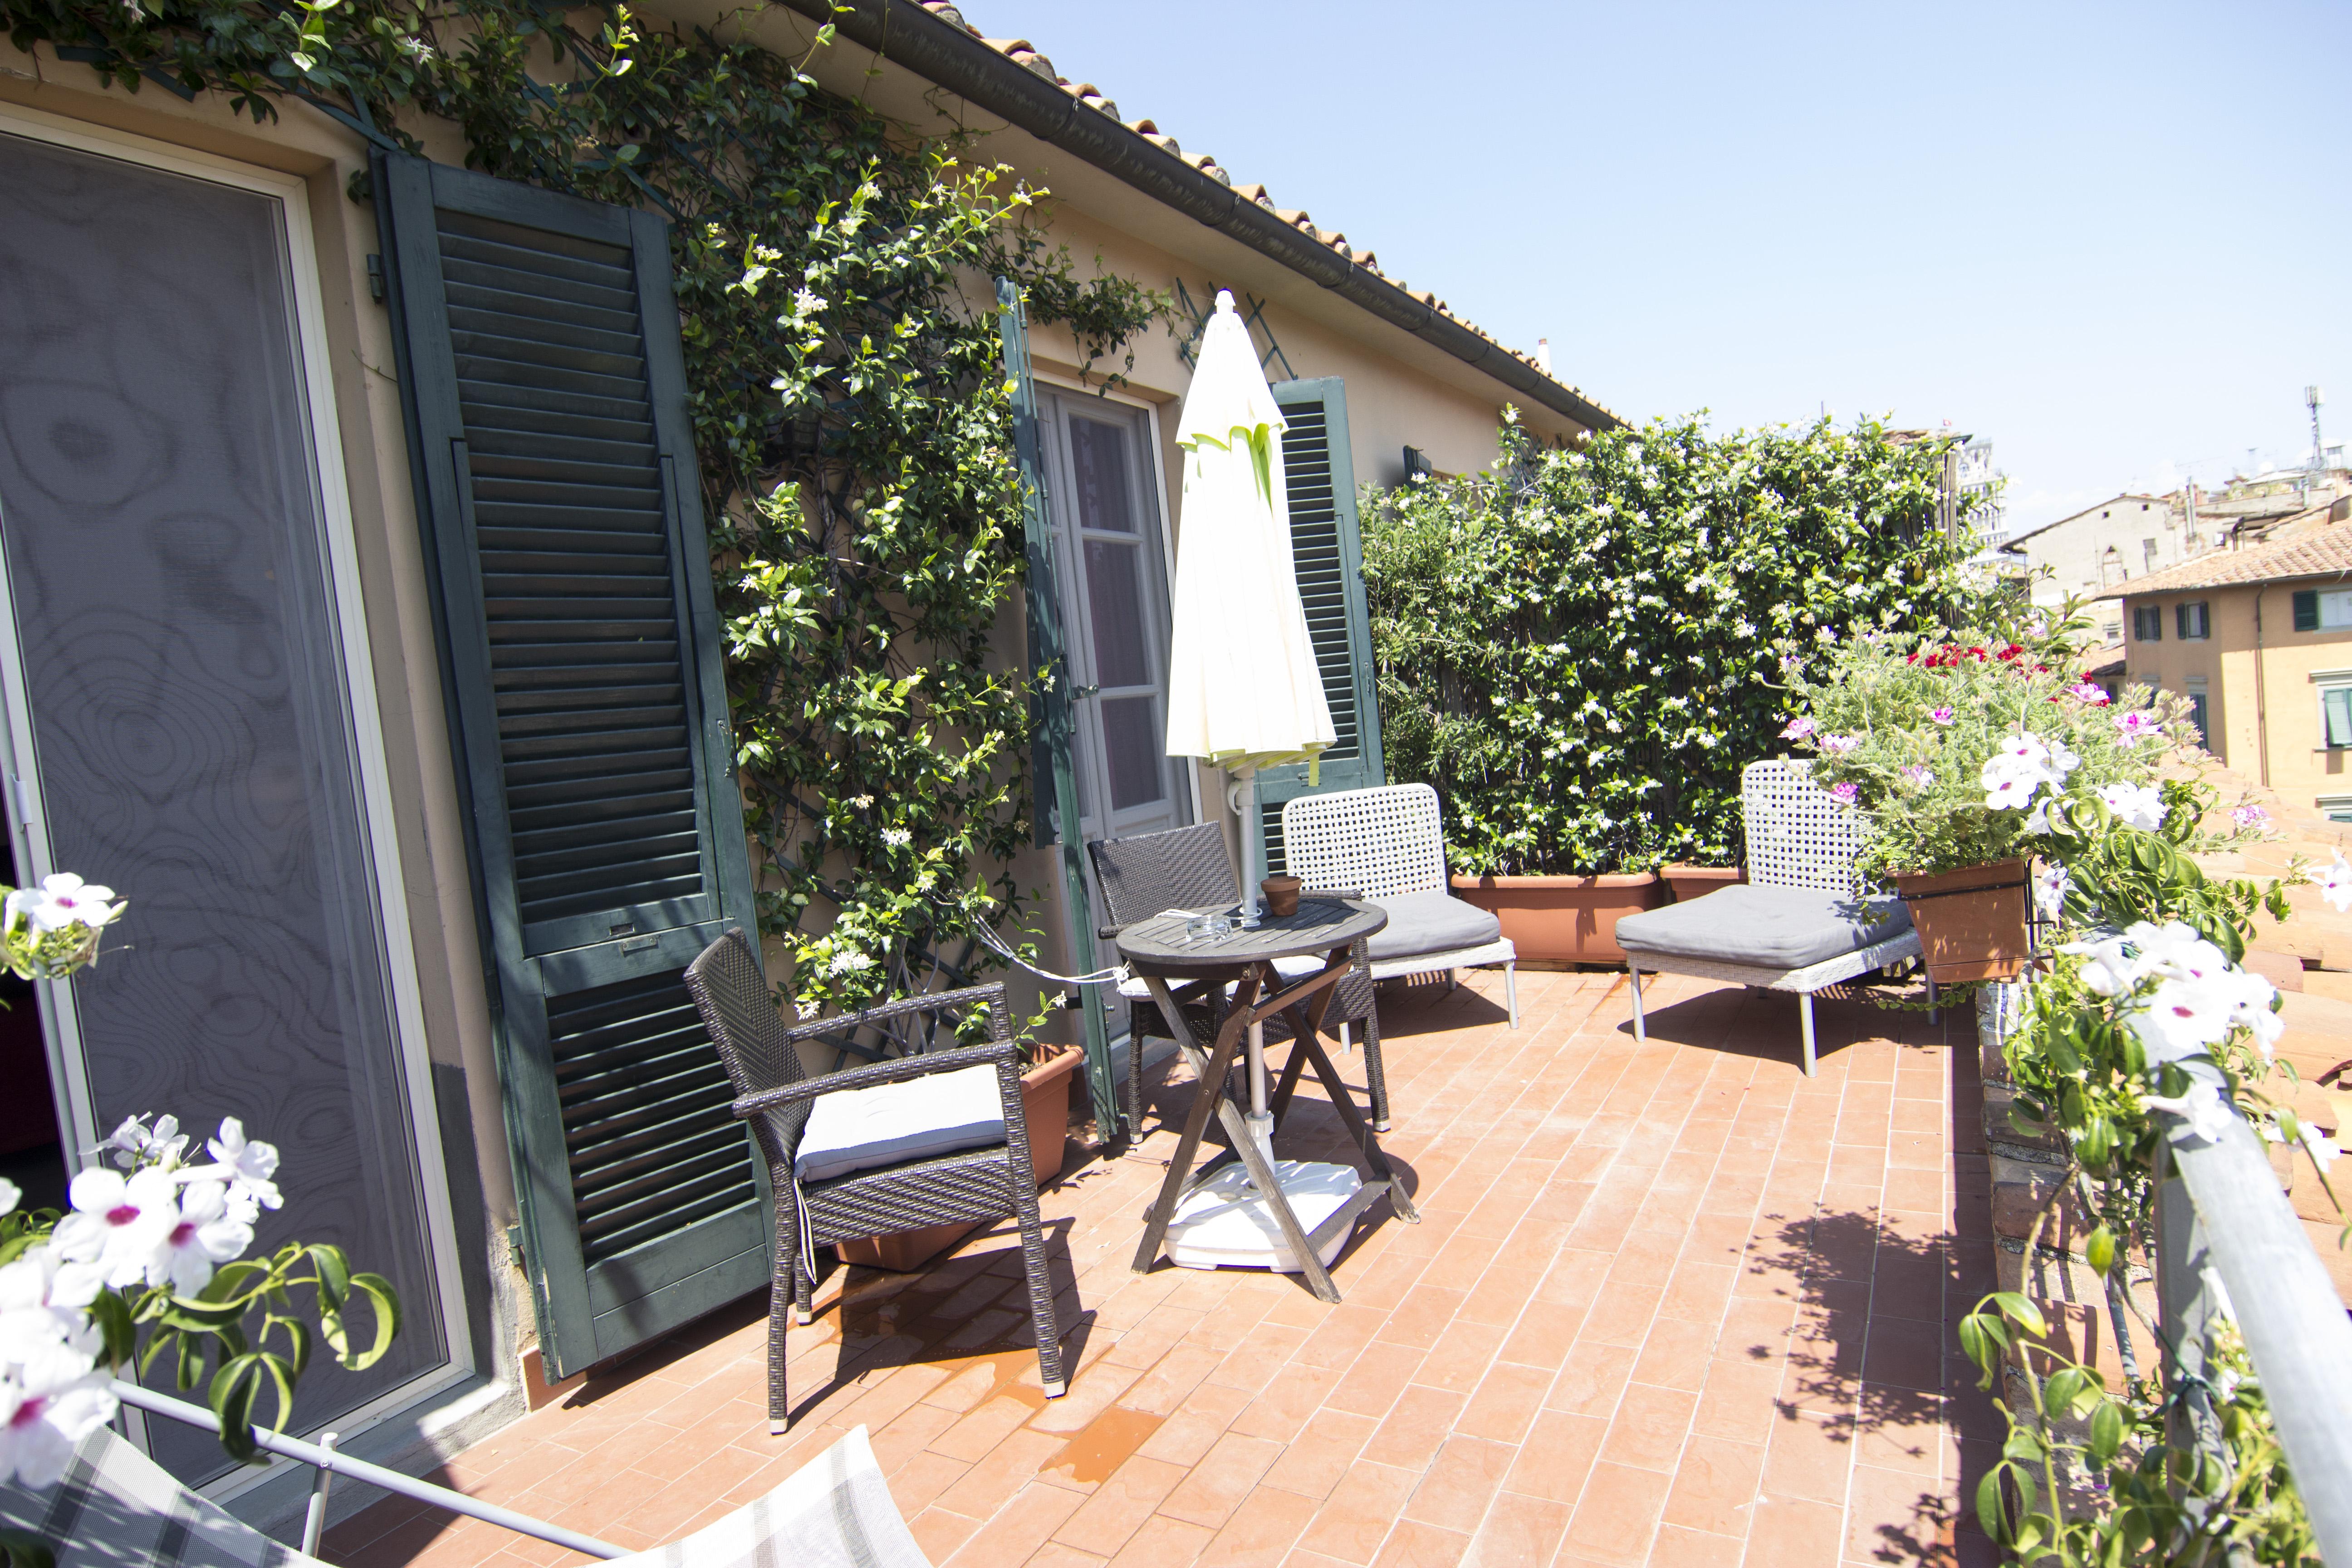 7Rooms B&B Pisa - Suite Dei Mille - Terrazzino privato